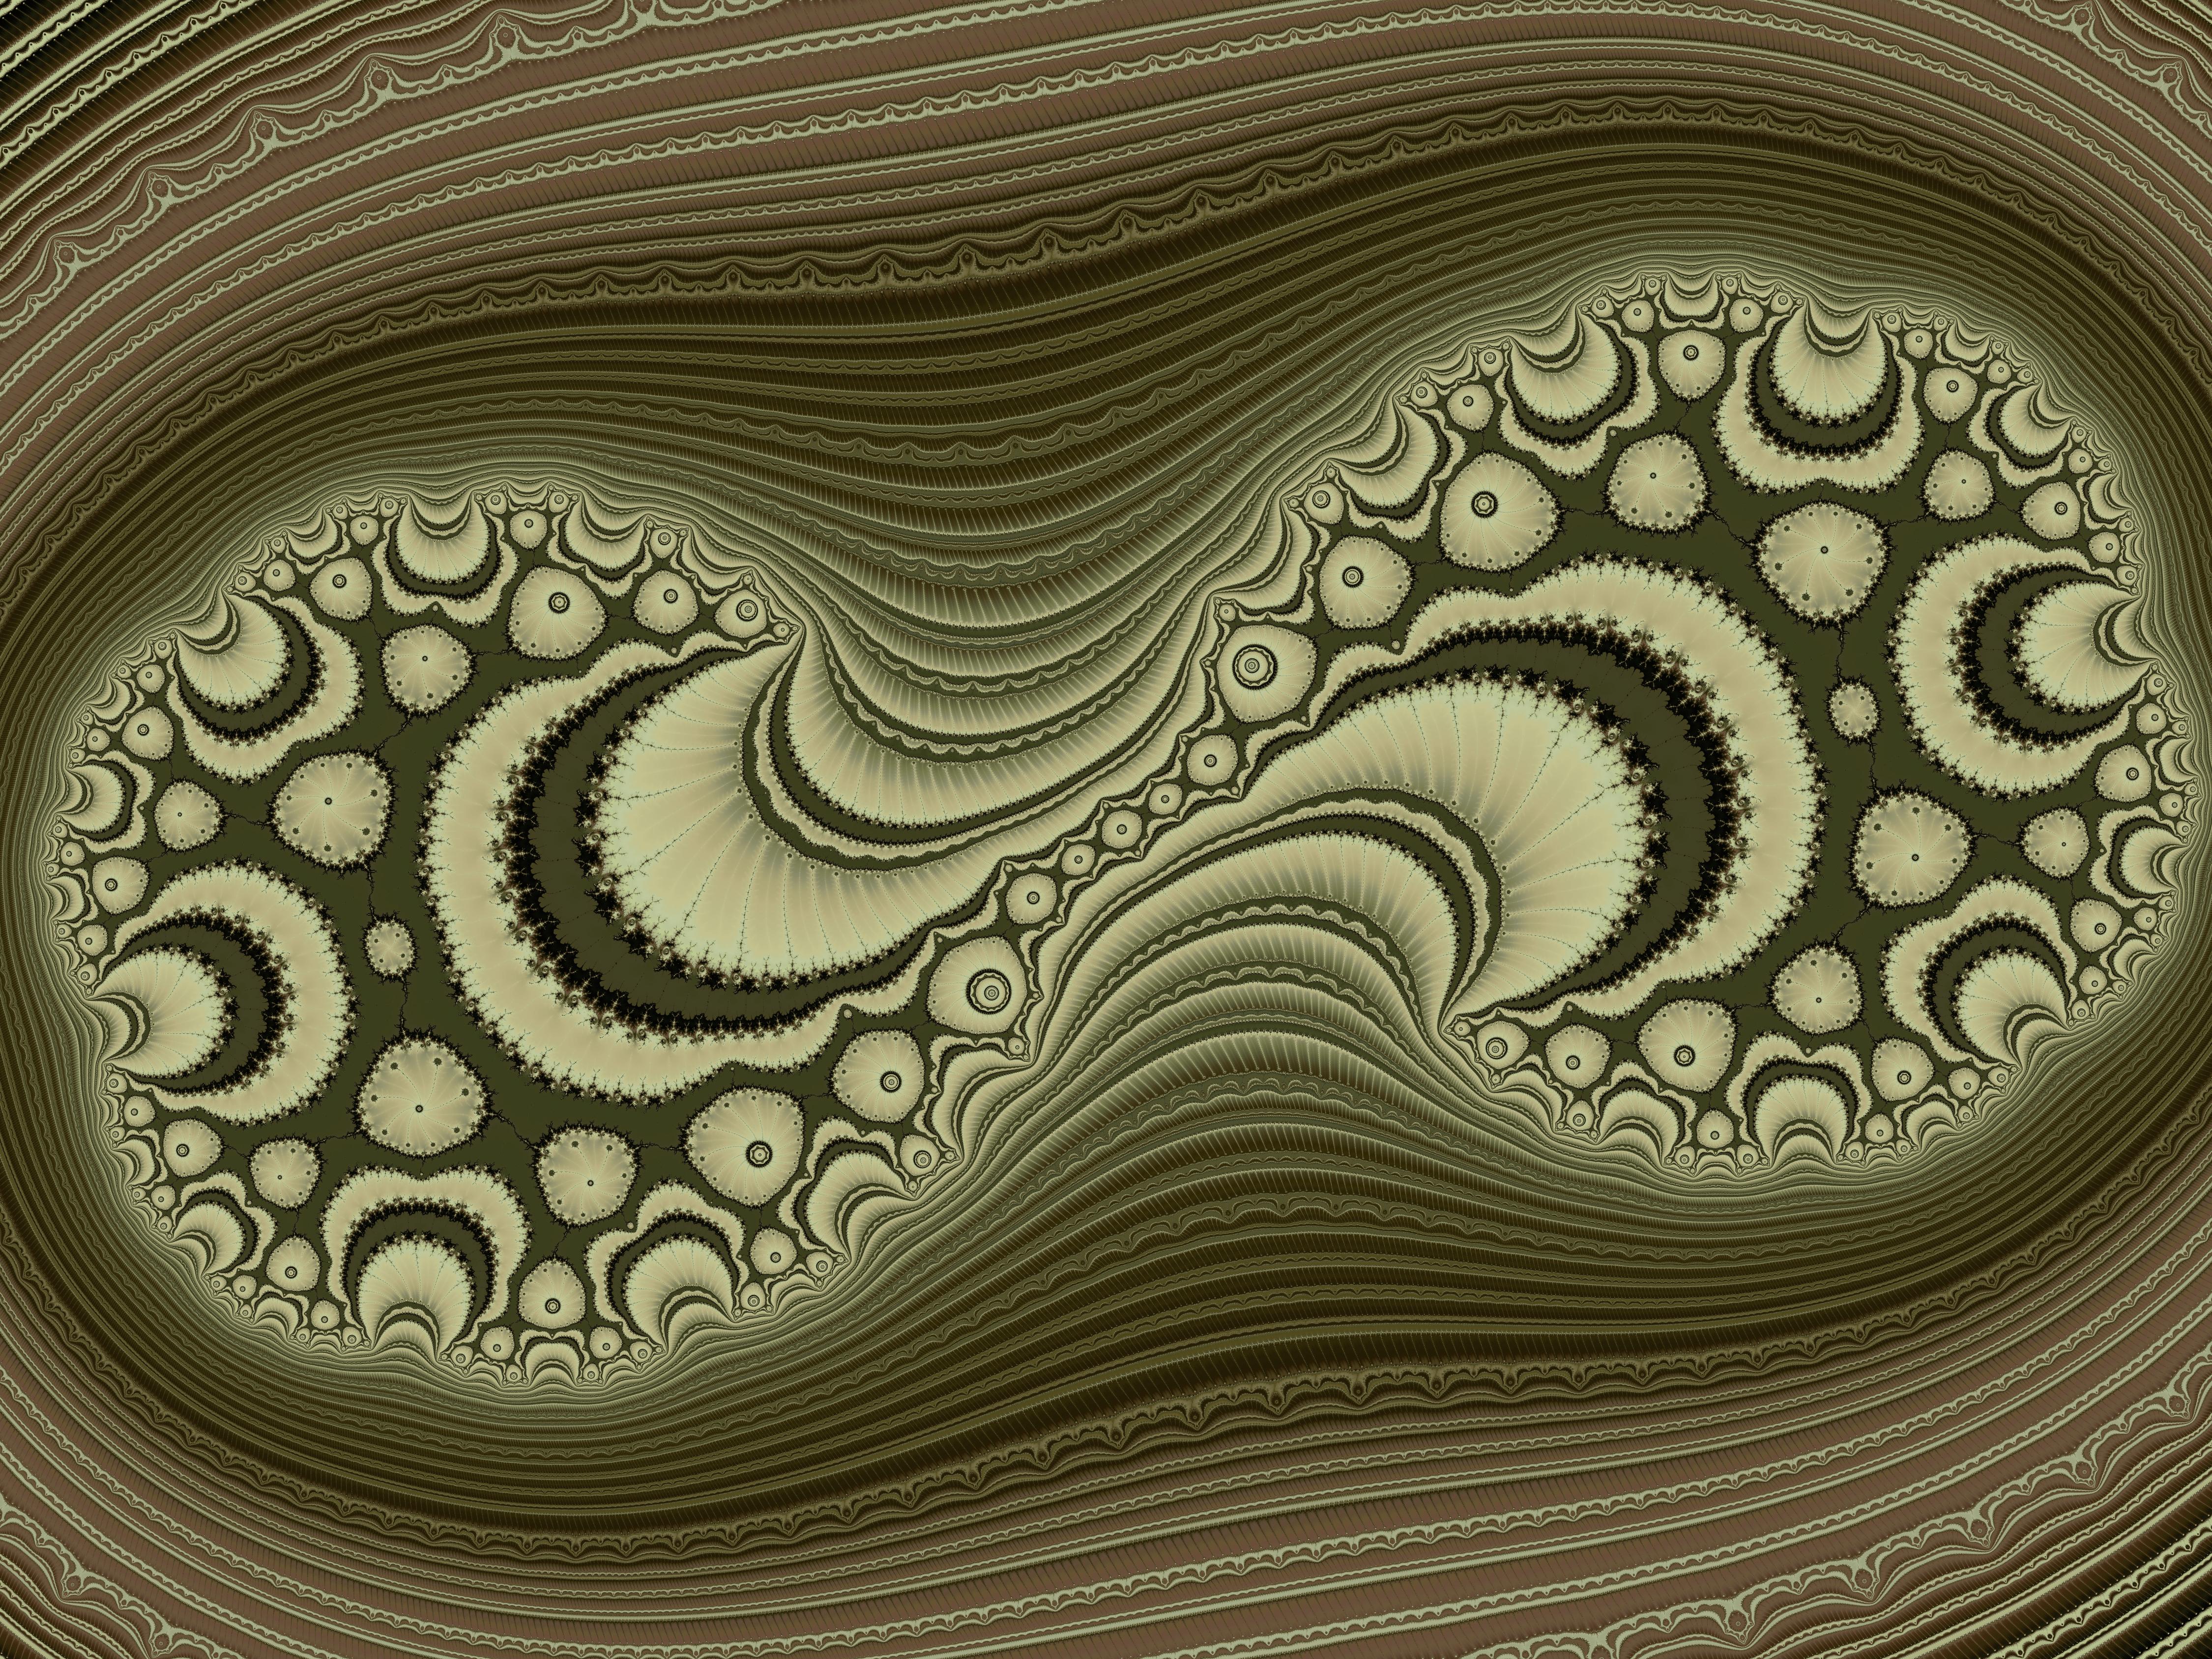 Flat surfaces by DinkydauSet